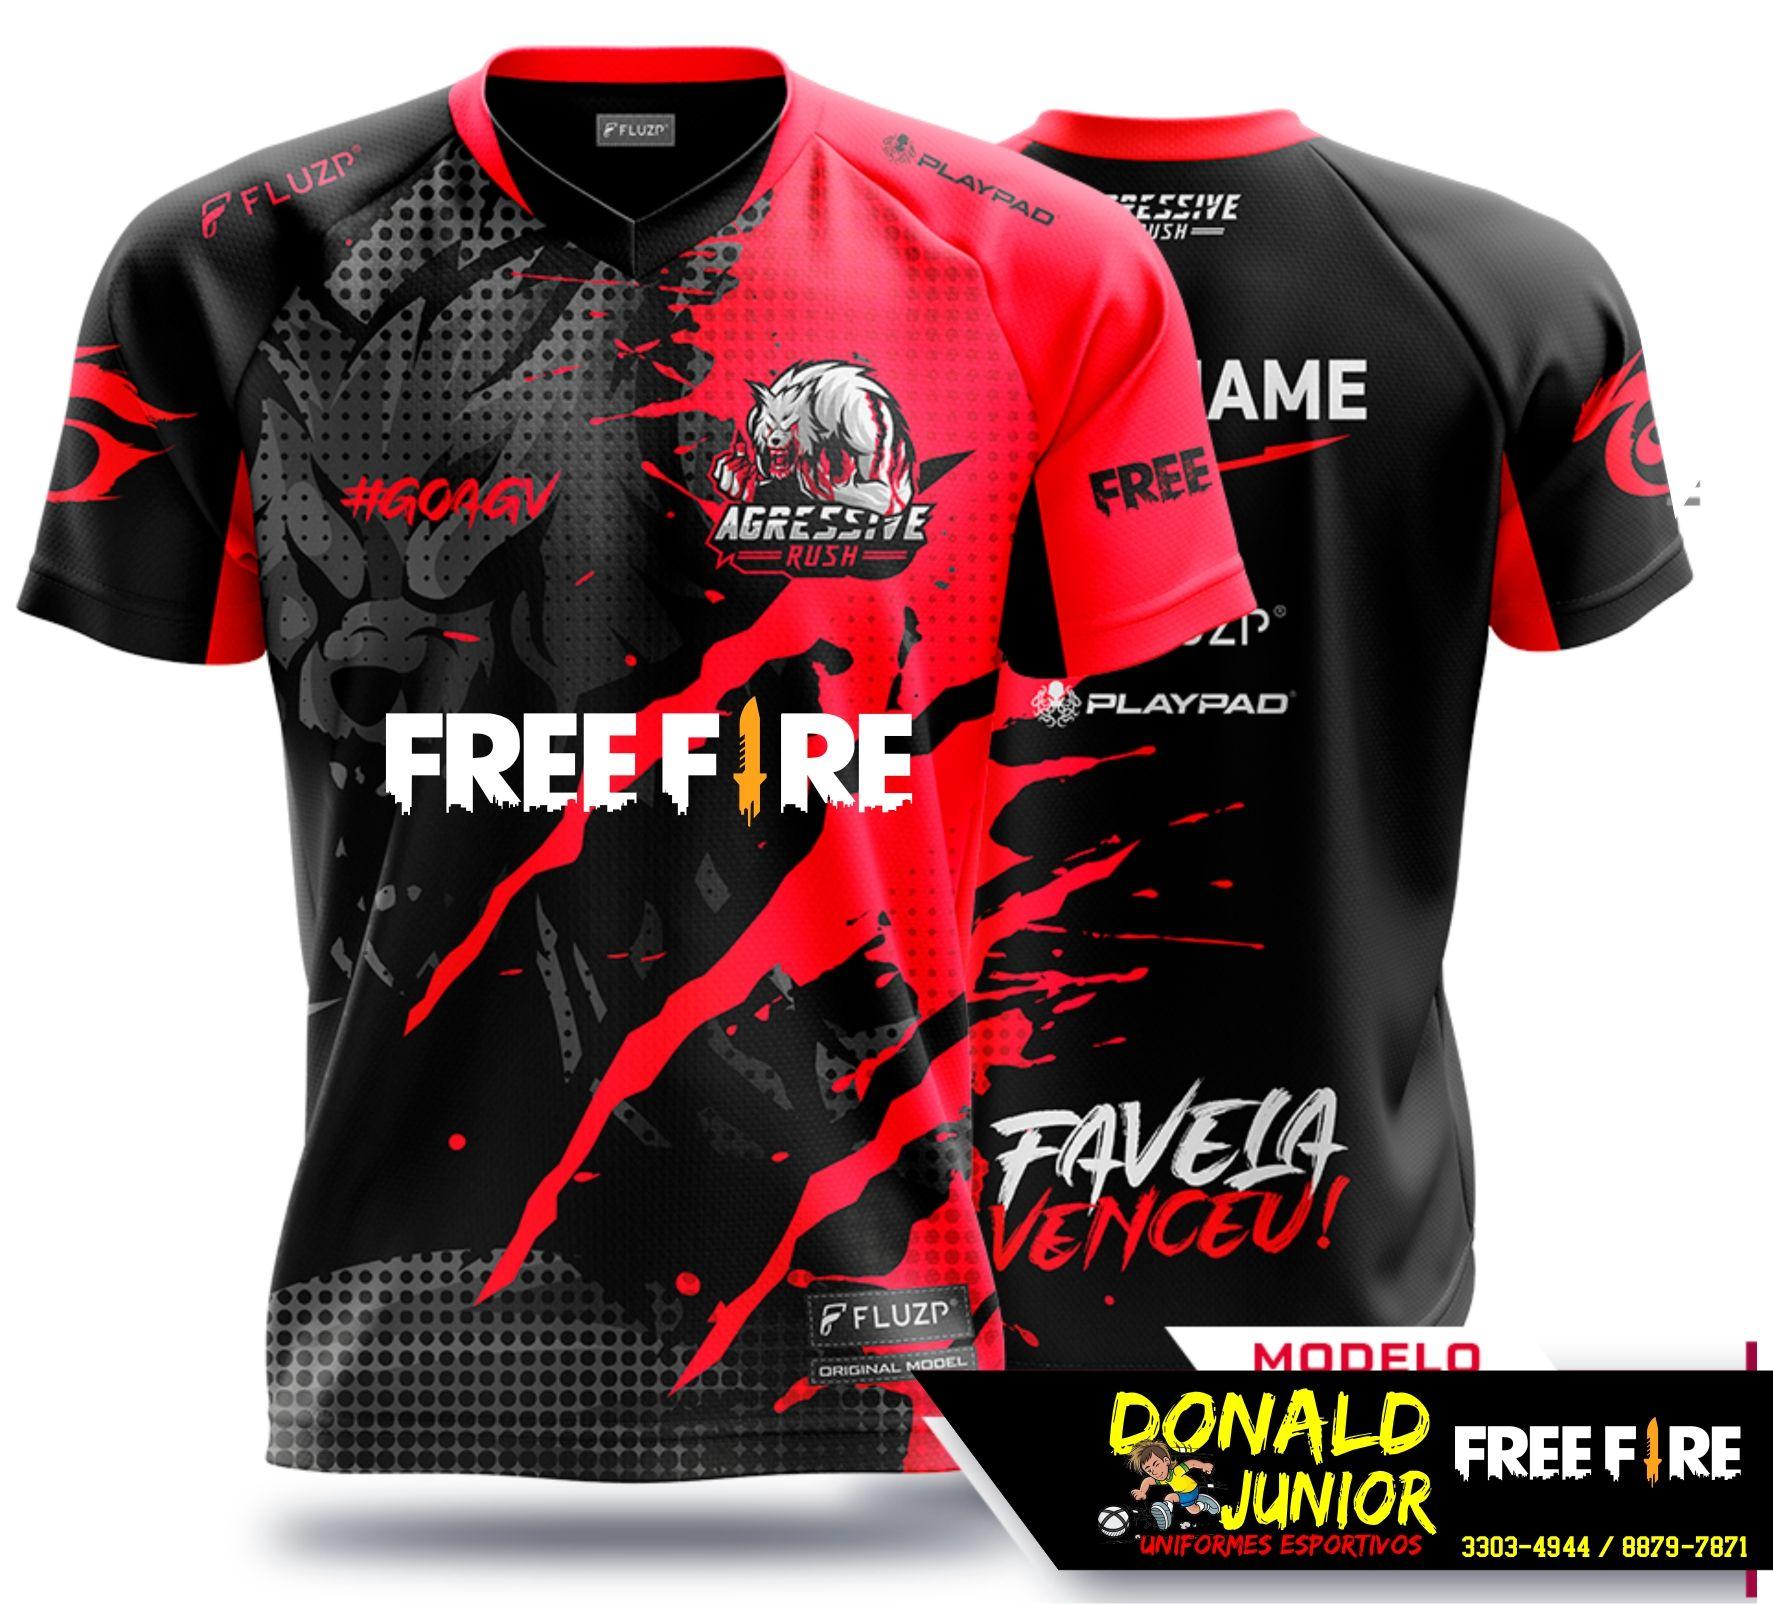 Download Camisas Free Fire Malha Dri Fit Impressao Digital Contato 86 98879 7871 Whatsapp Kaos Kemeja Desain